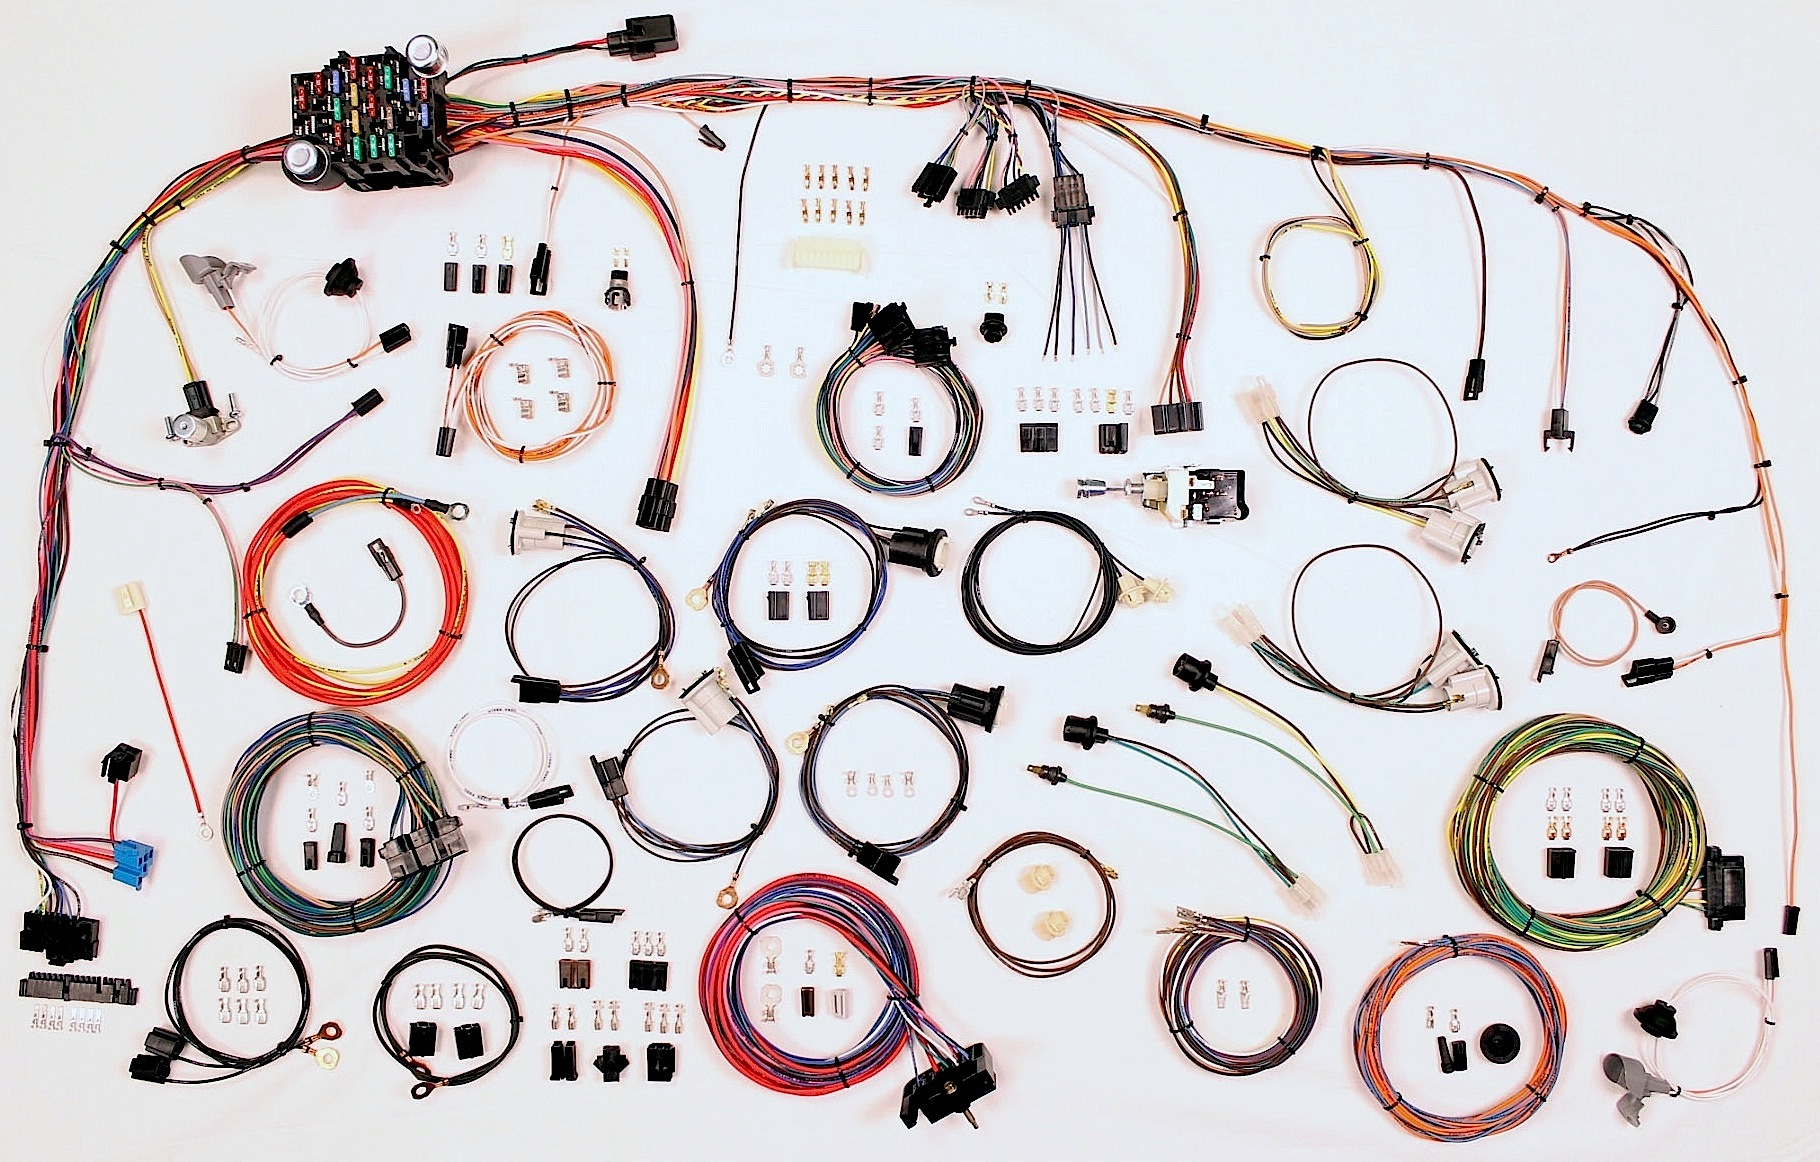 American Autowire 73-82 GM P/U Wiring Harness